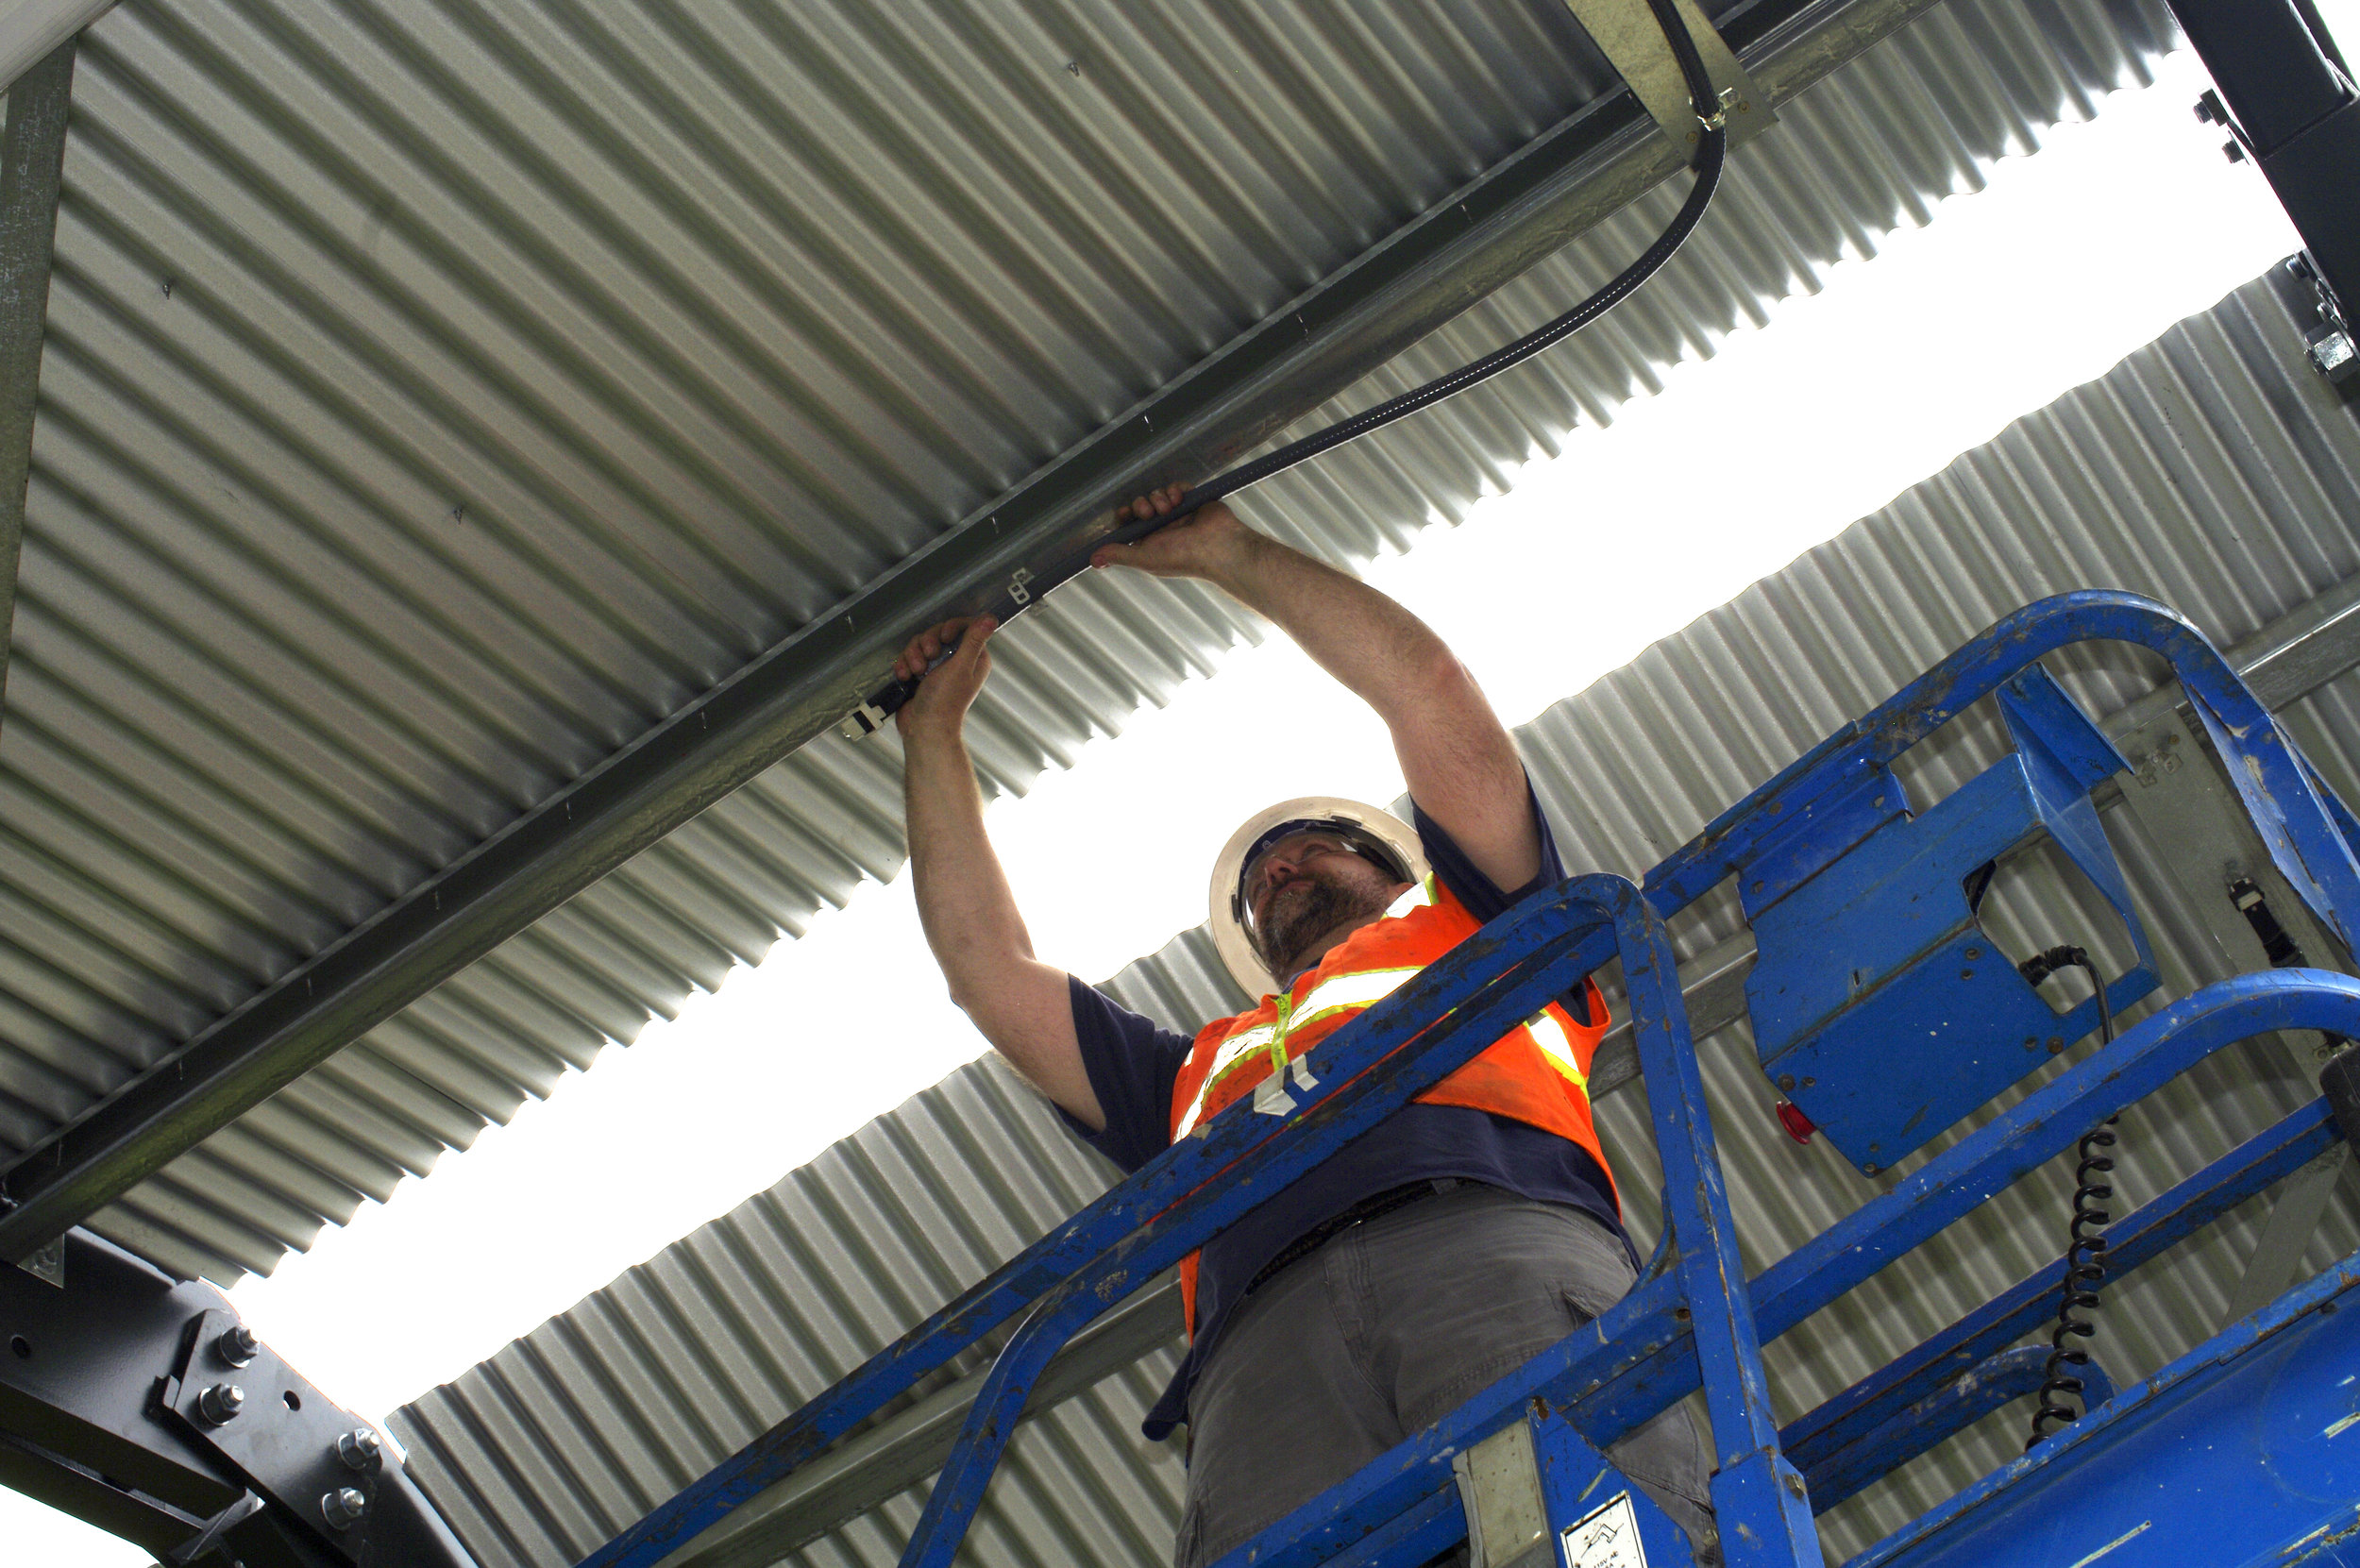 Wiring system install